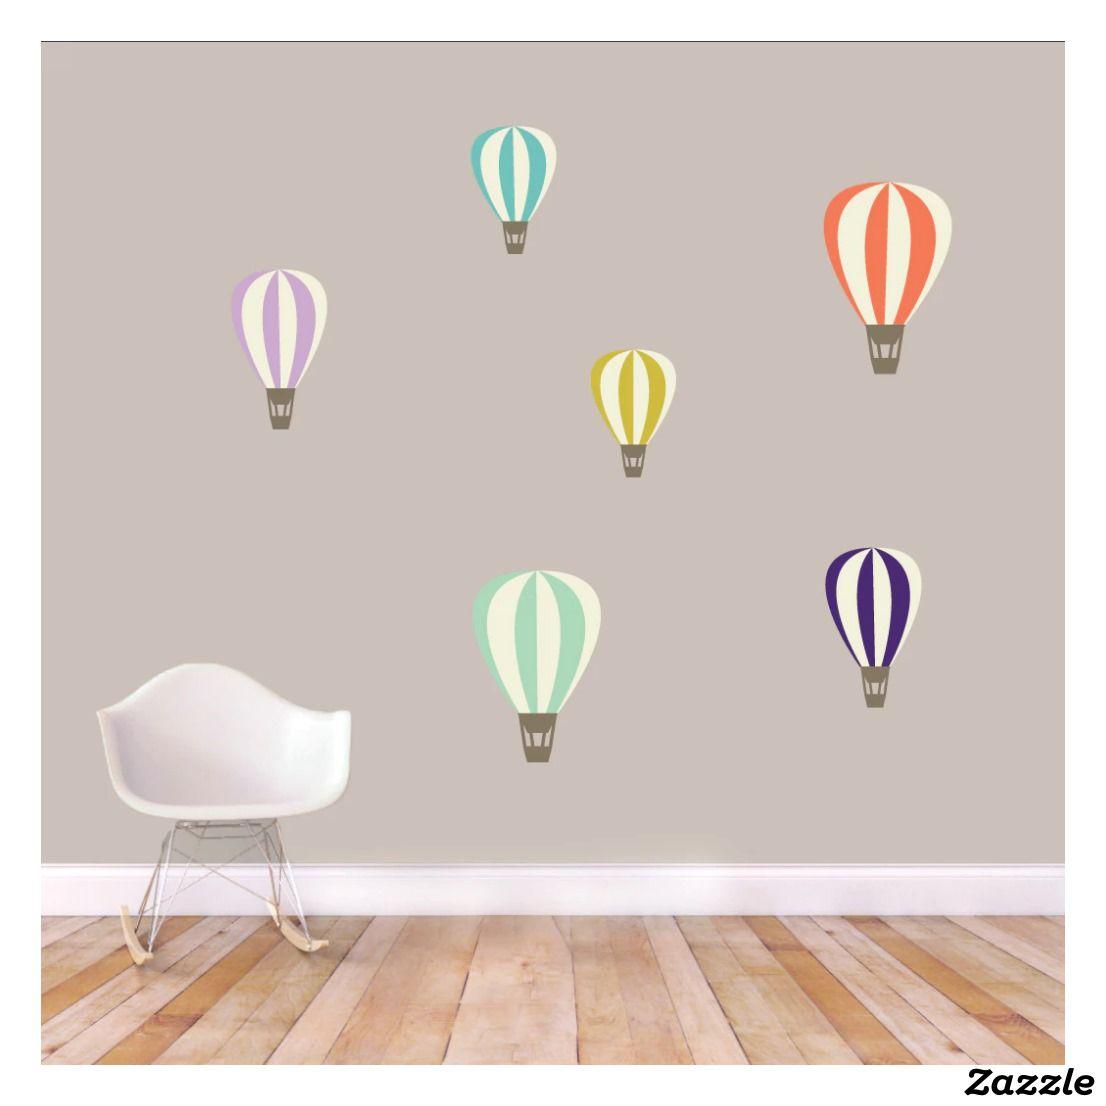 Colorful Hot Air Balloons Printed Wall Decal Set Zazzle Com